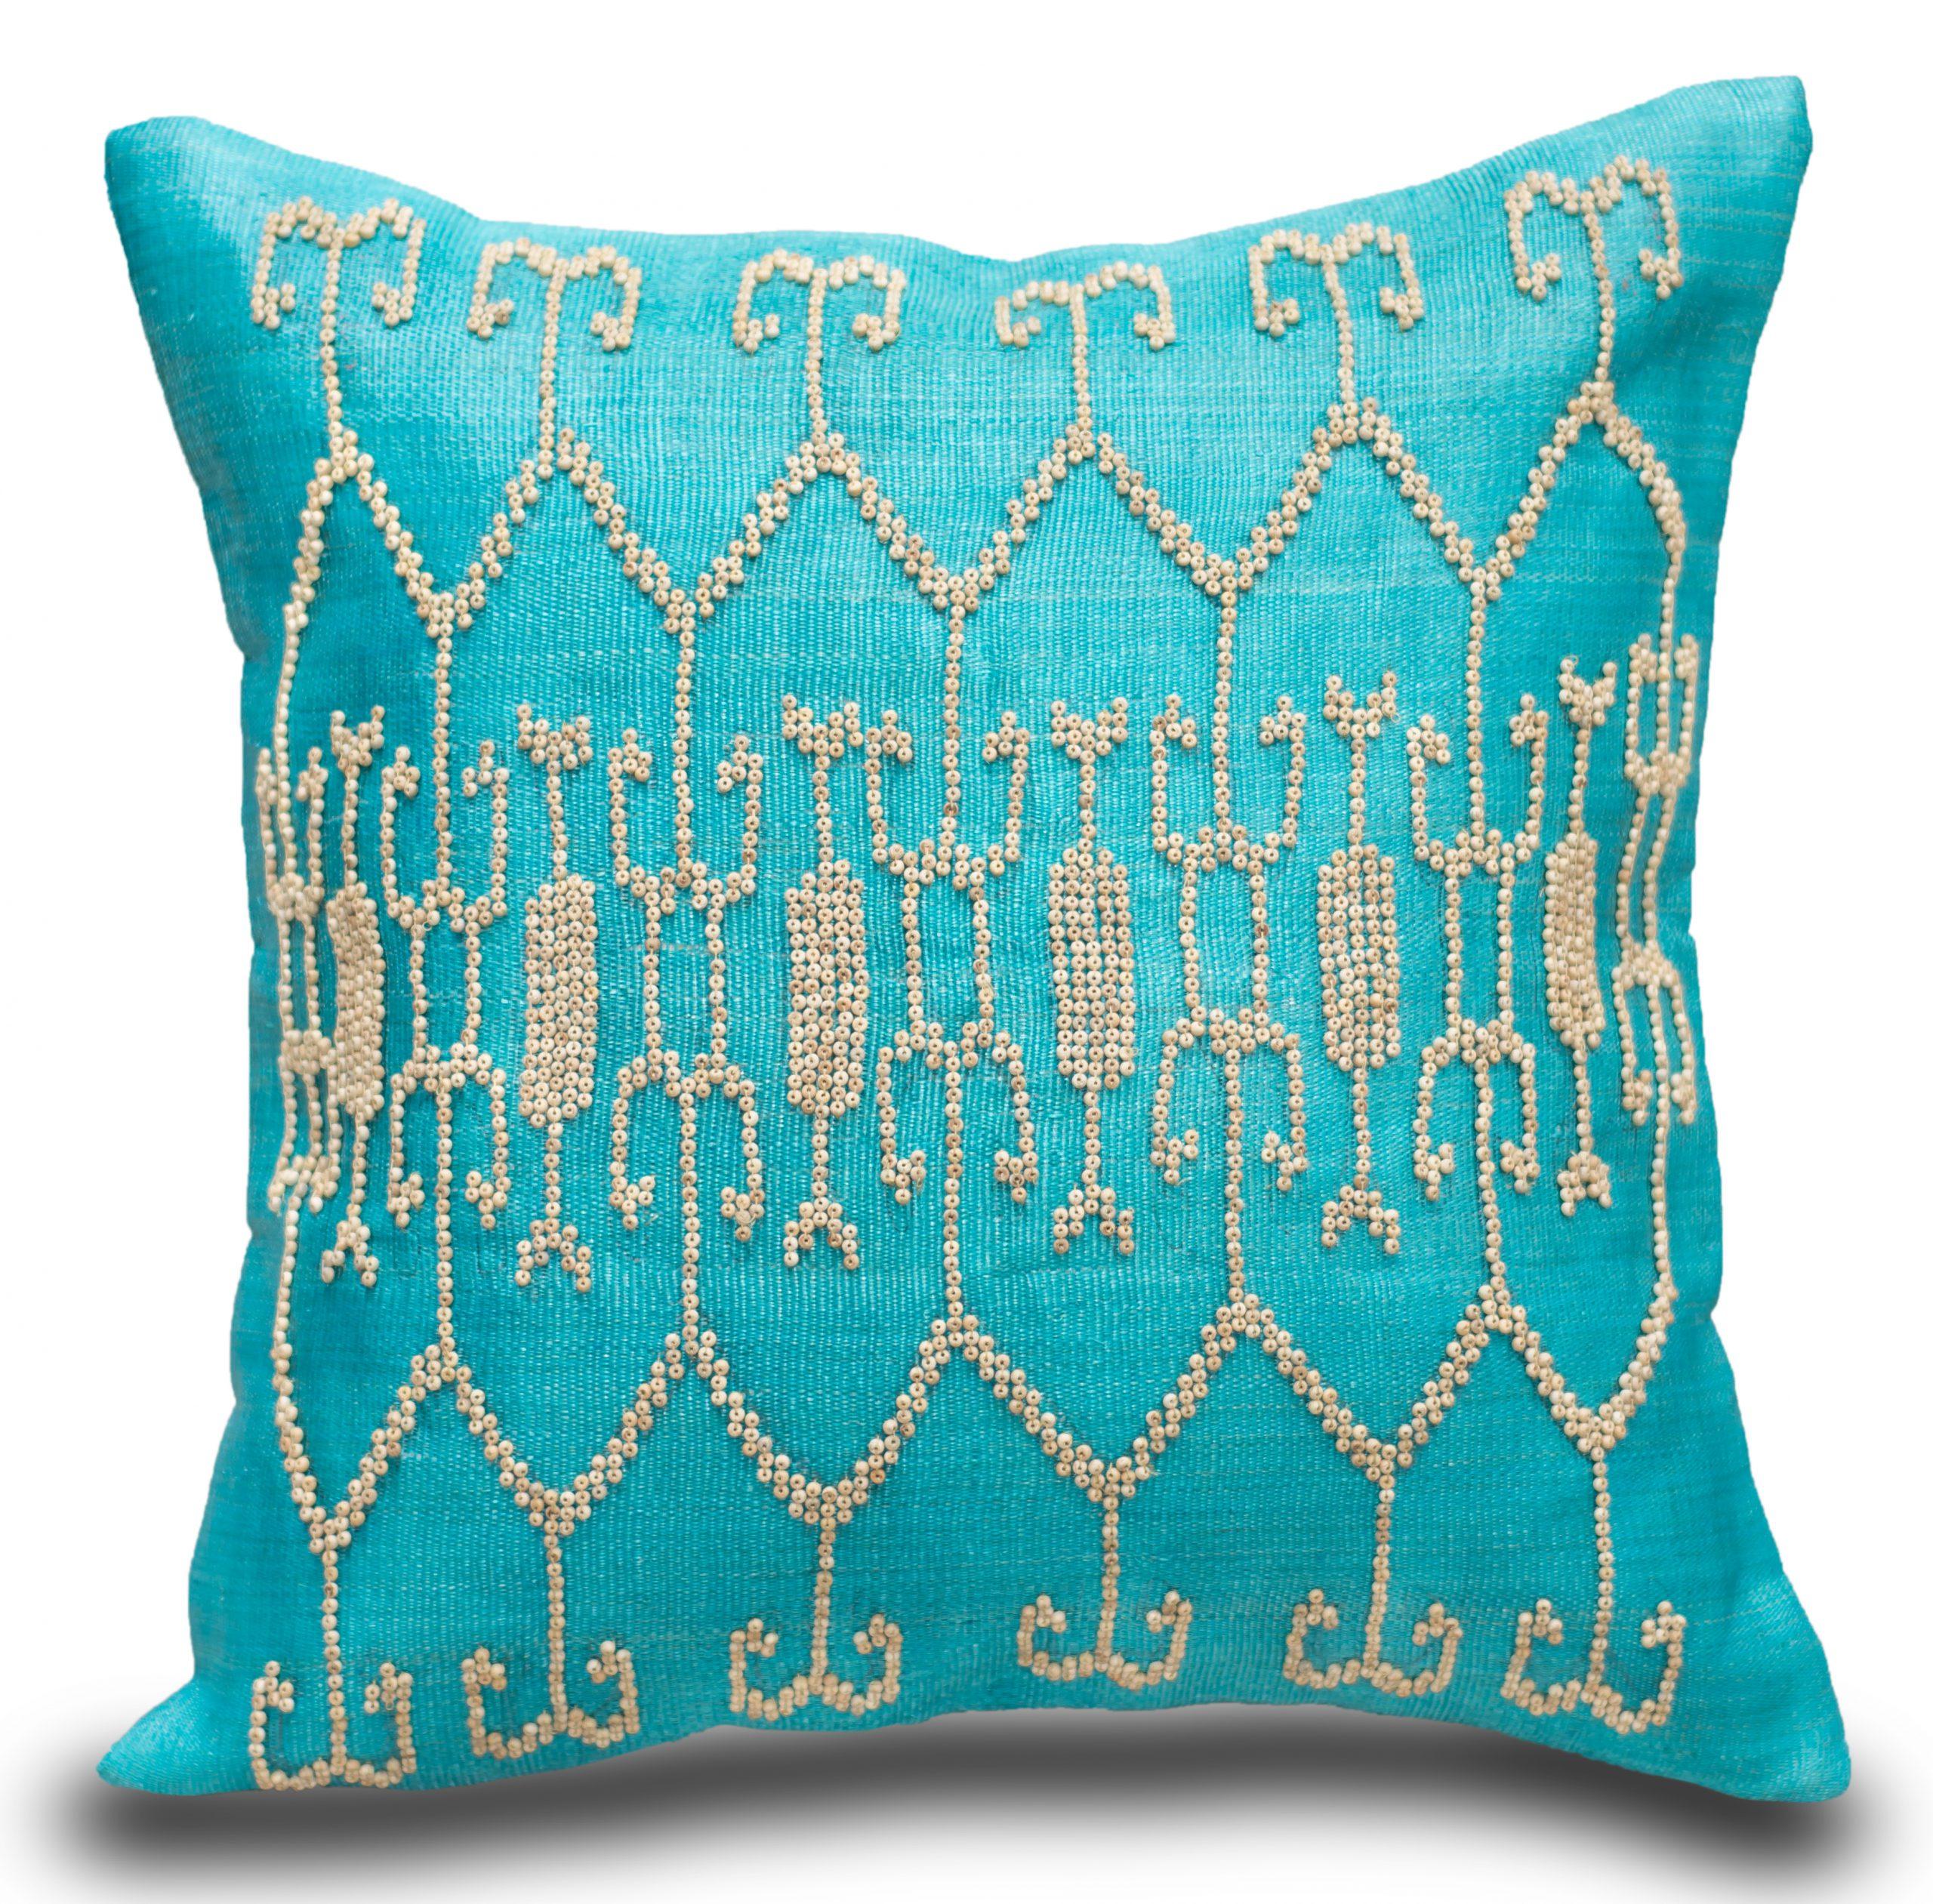 tnalak cushion beaded ikat center turquoise